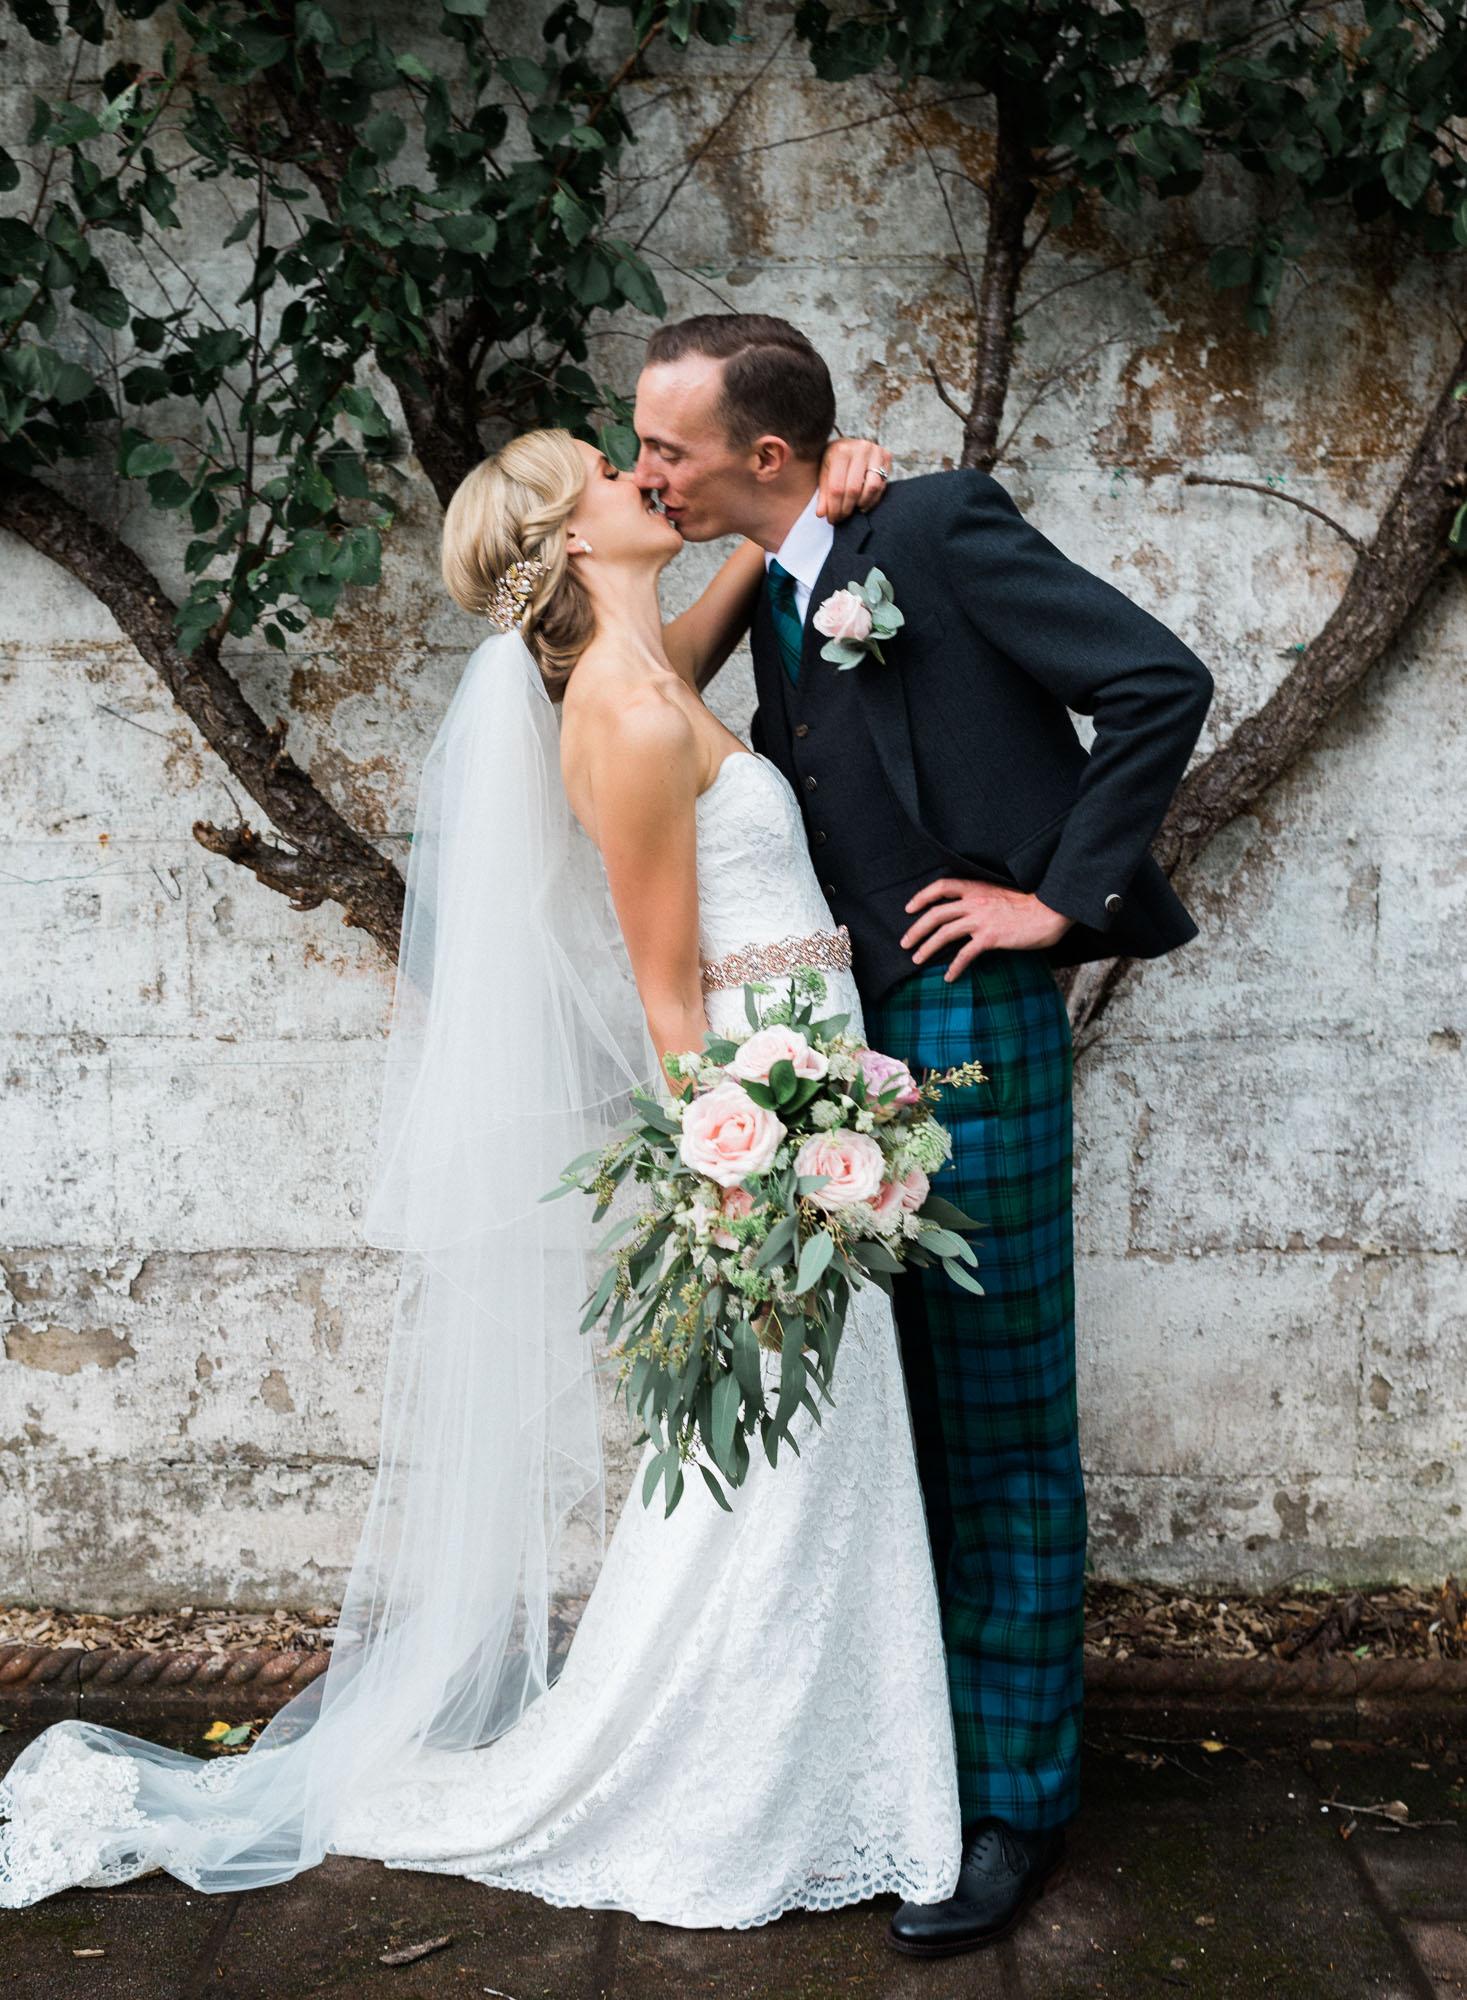 scottish_wedding_blairquhan_castle-50.jpg